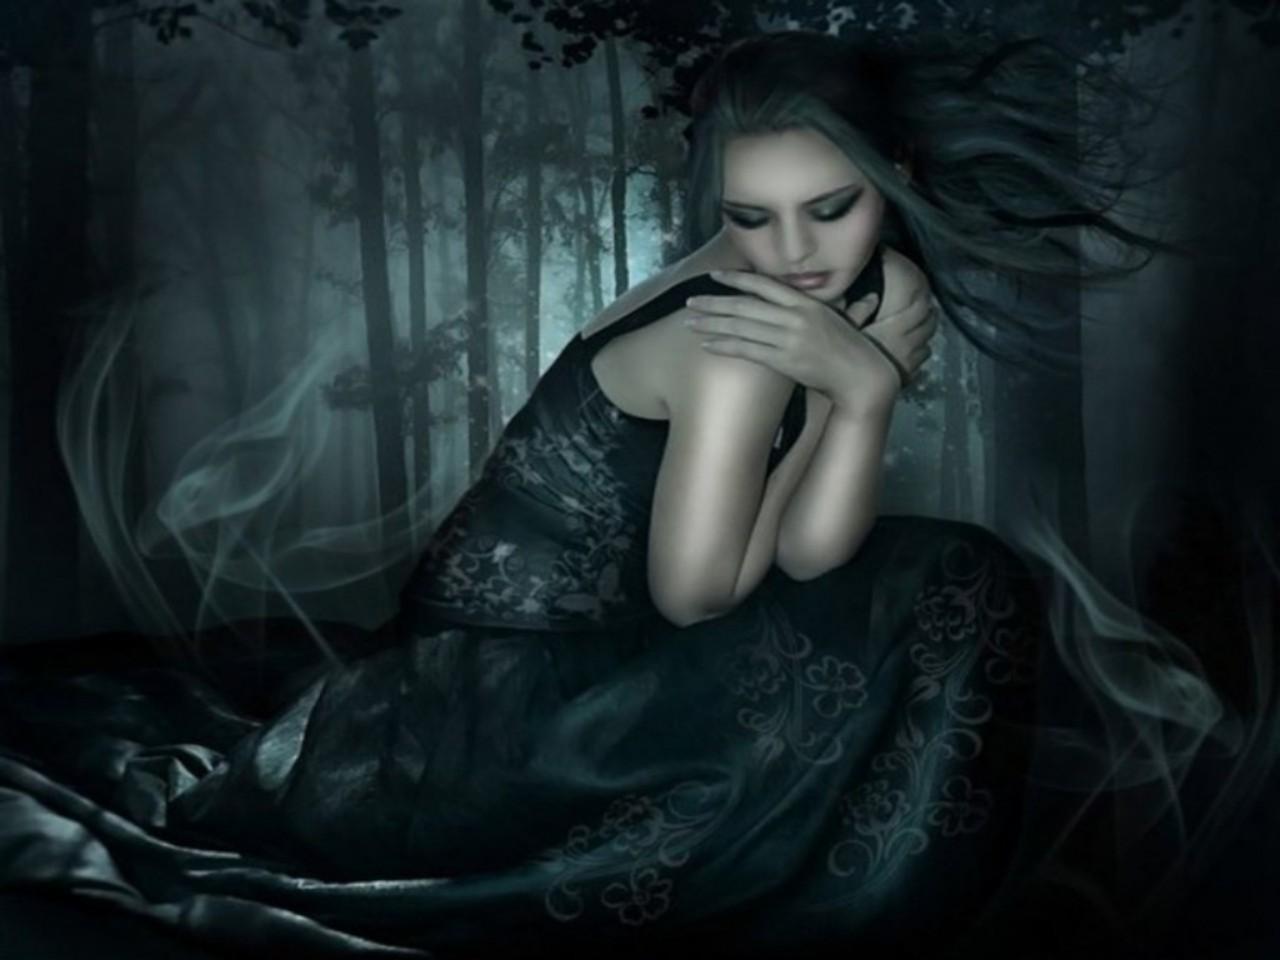 Gothic Dark Wallpapers   Download Dark Gothic Backgrounds 1280x960